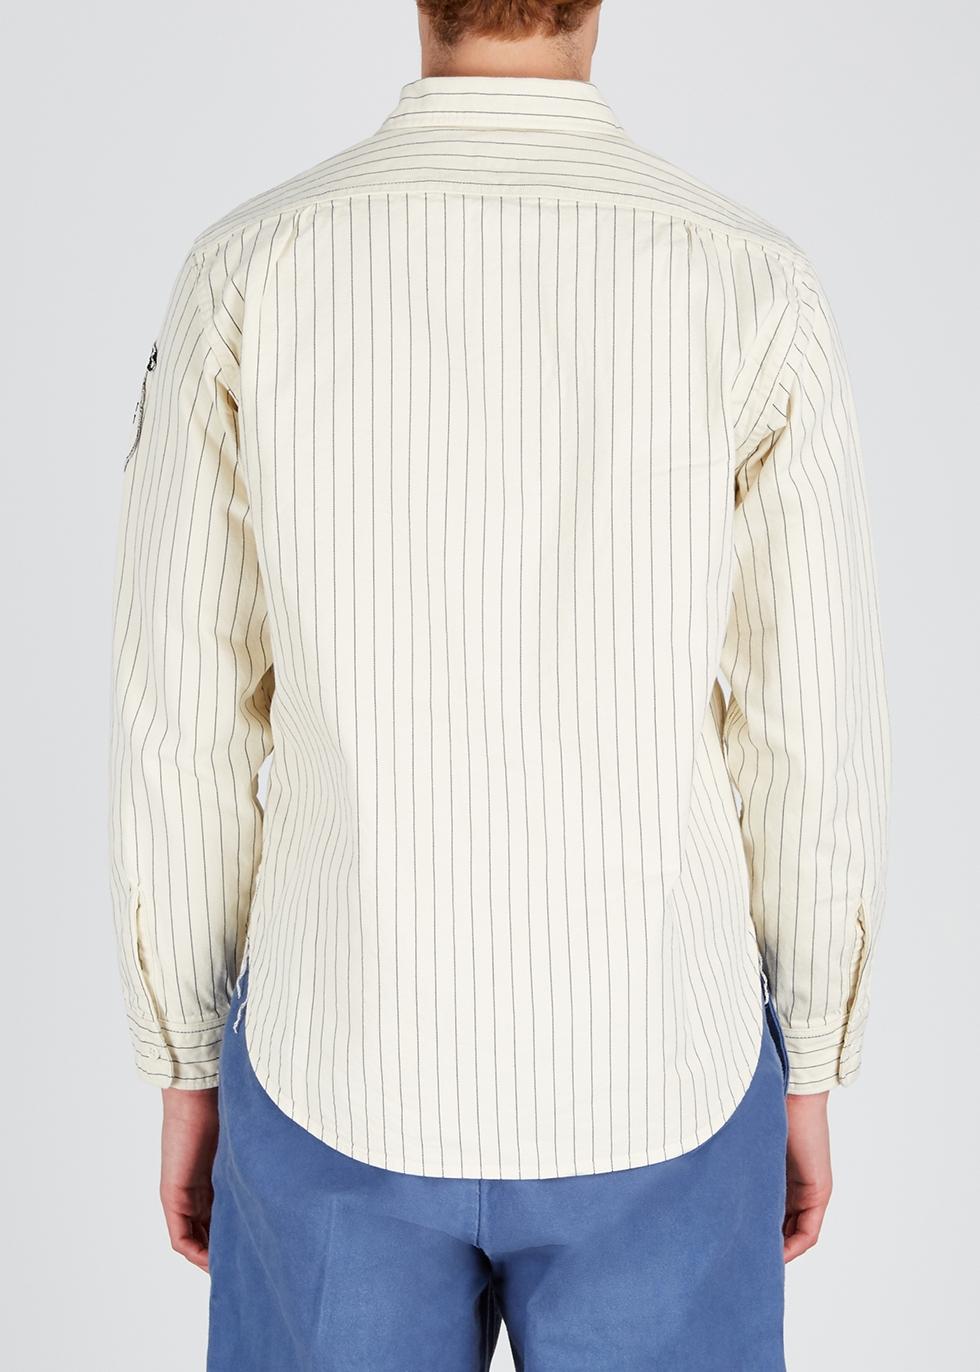 Curry Up striped cotton shirt - Human Made